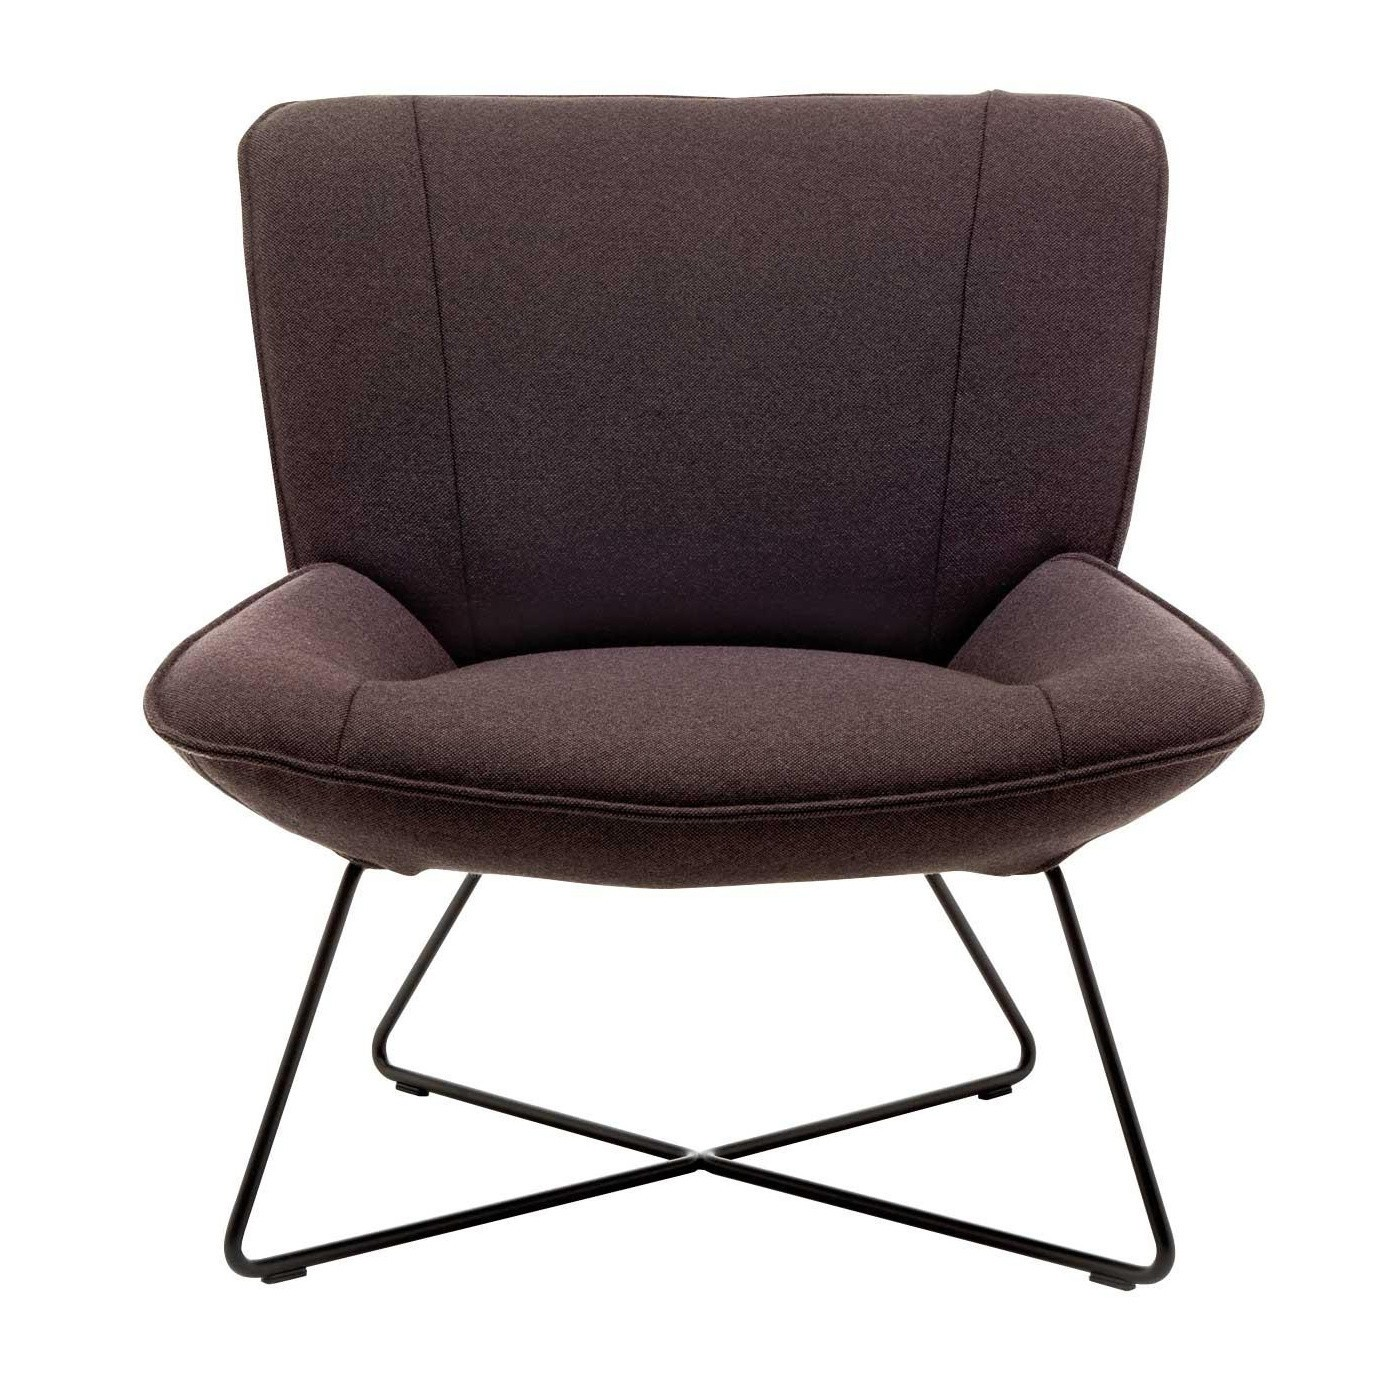 Rolf Benz 383 Sessel Ambientedirect